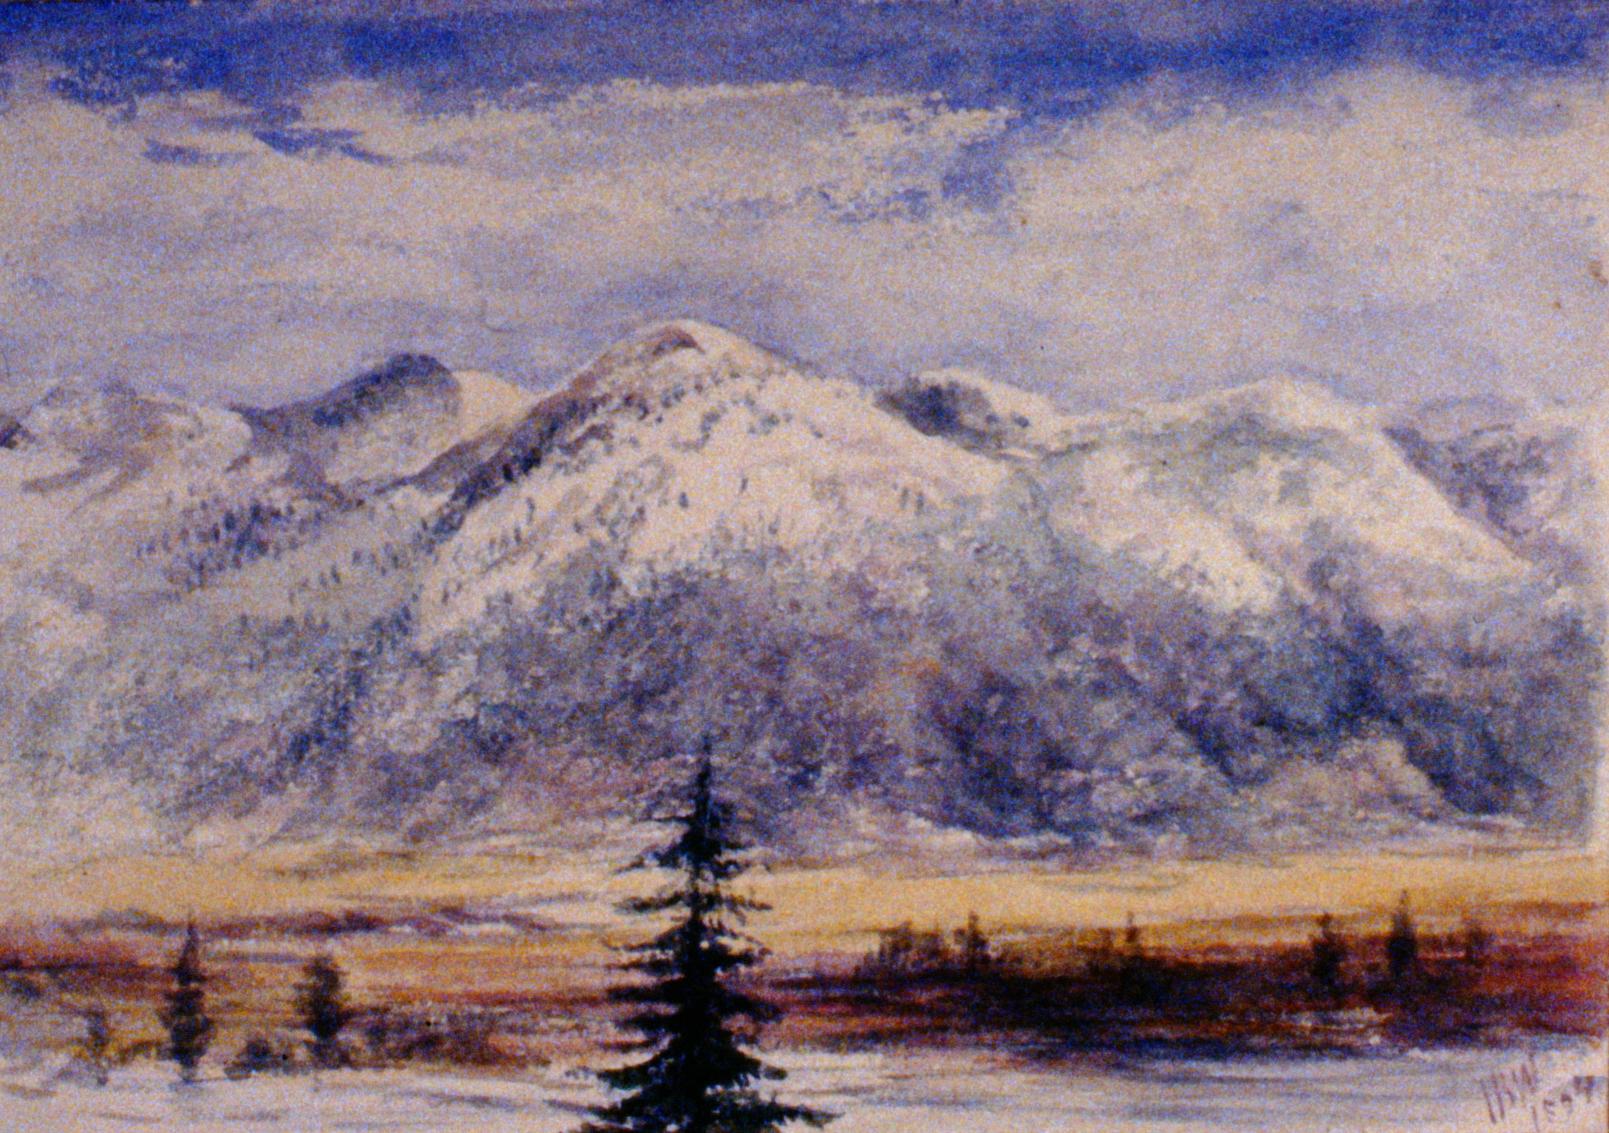 Cawston Bench NE , 1894, Julia Bullock Webster, watercolour, 17.5 x 25.1 cm, 1983.02.02.Gift of Mrs. Barbara Steel.